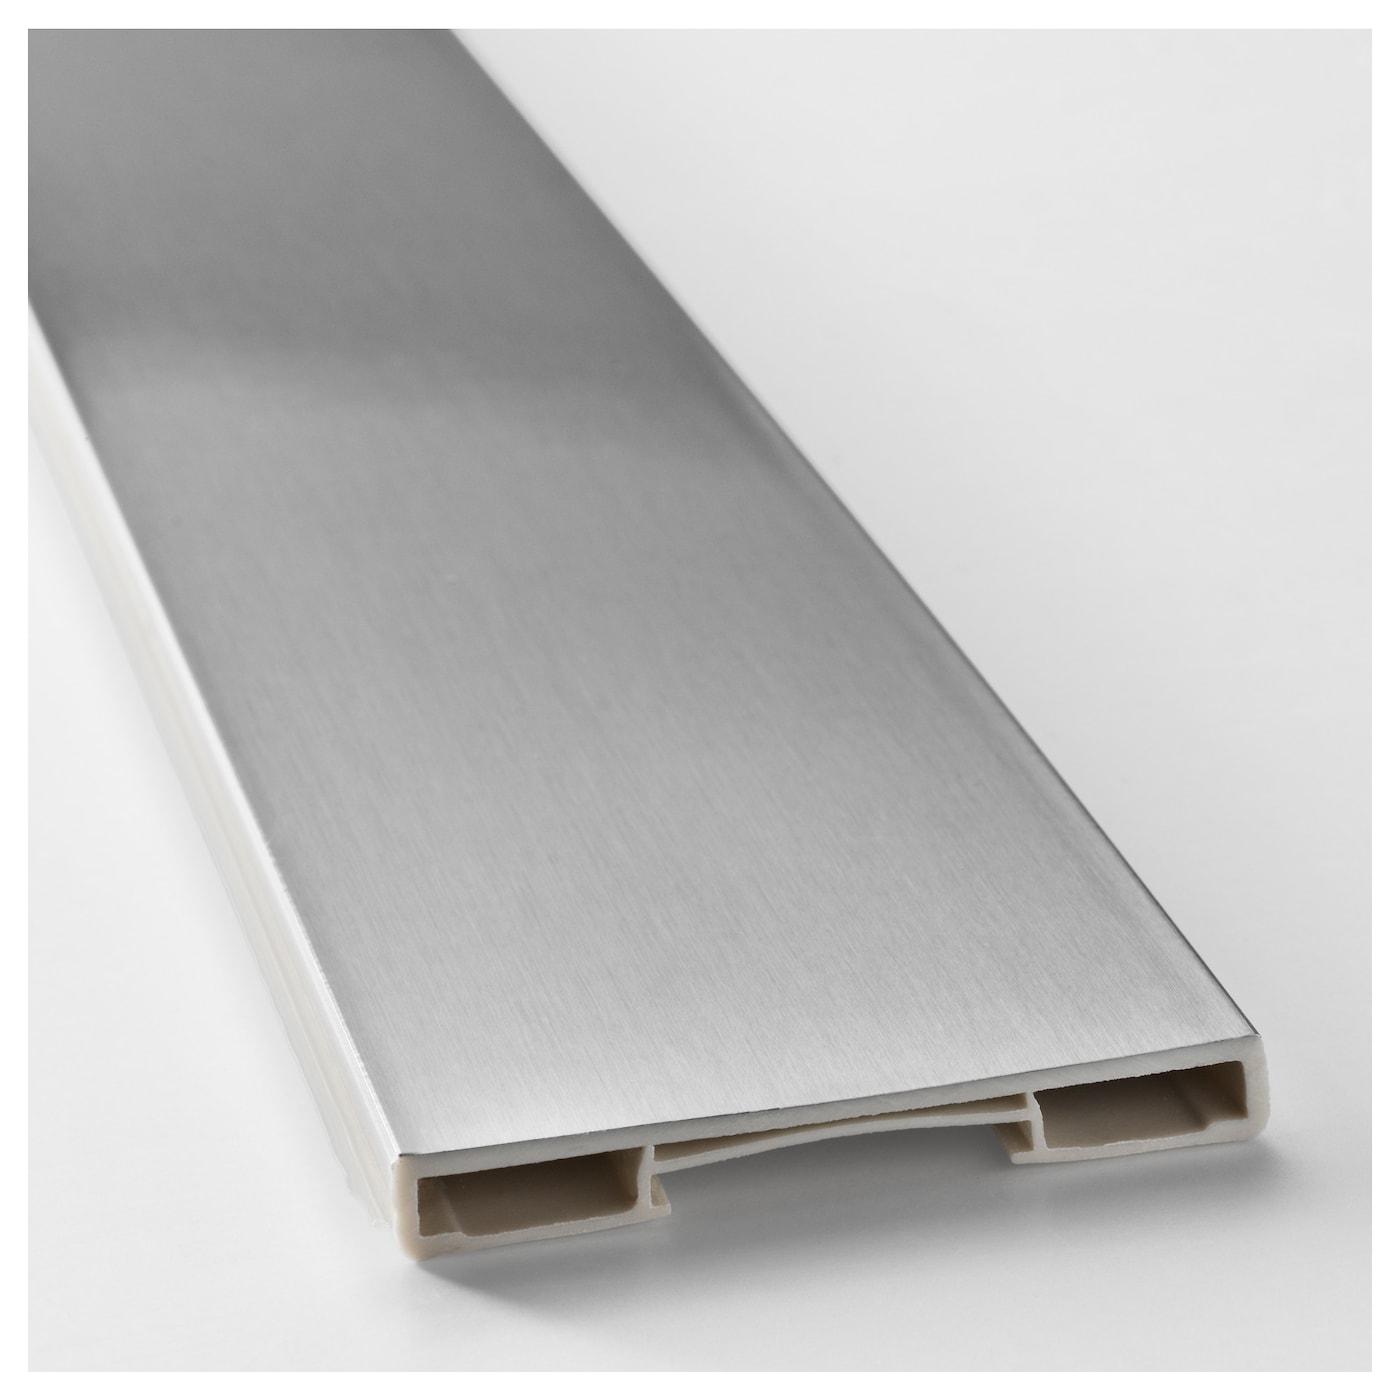 grevsta plinth stainless steel colour 220x8 cm ikea. Black Bedroom Furniture Sets. Home Design Ideas